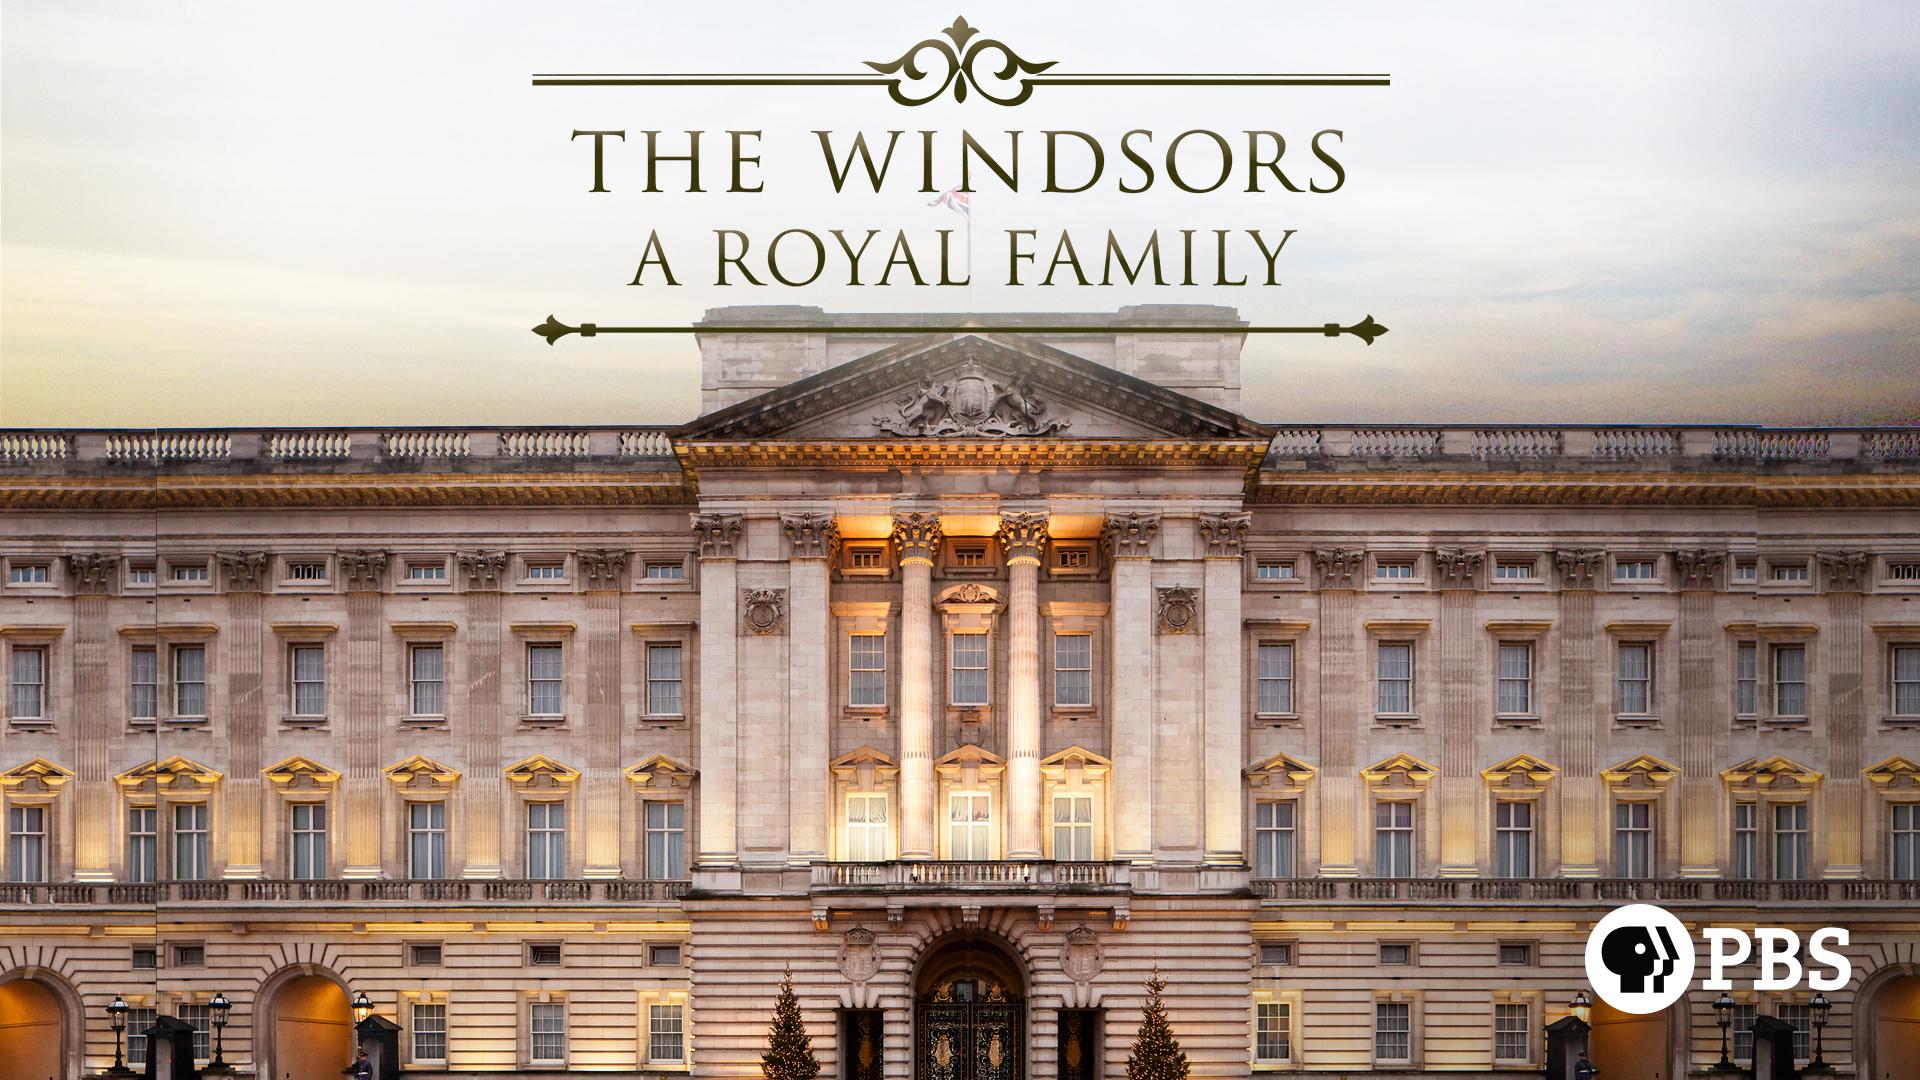 The Windsors: A Royal Family Season 1